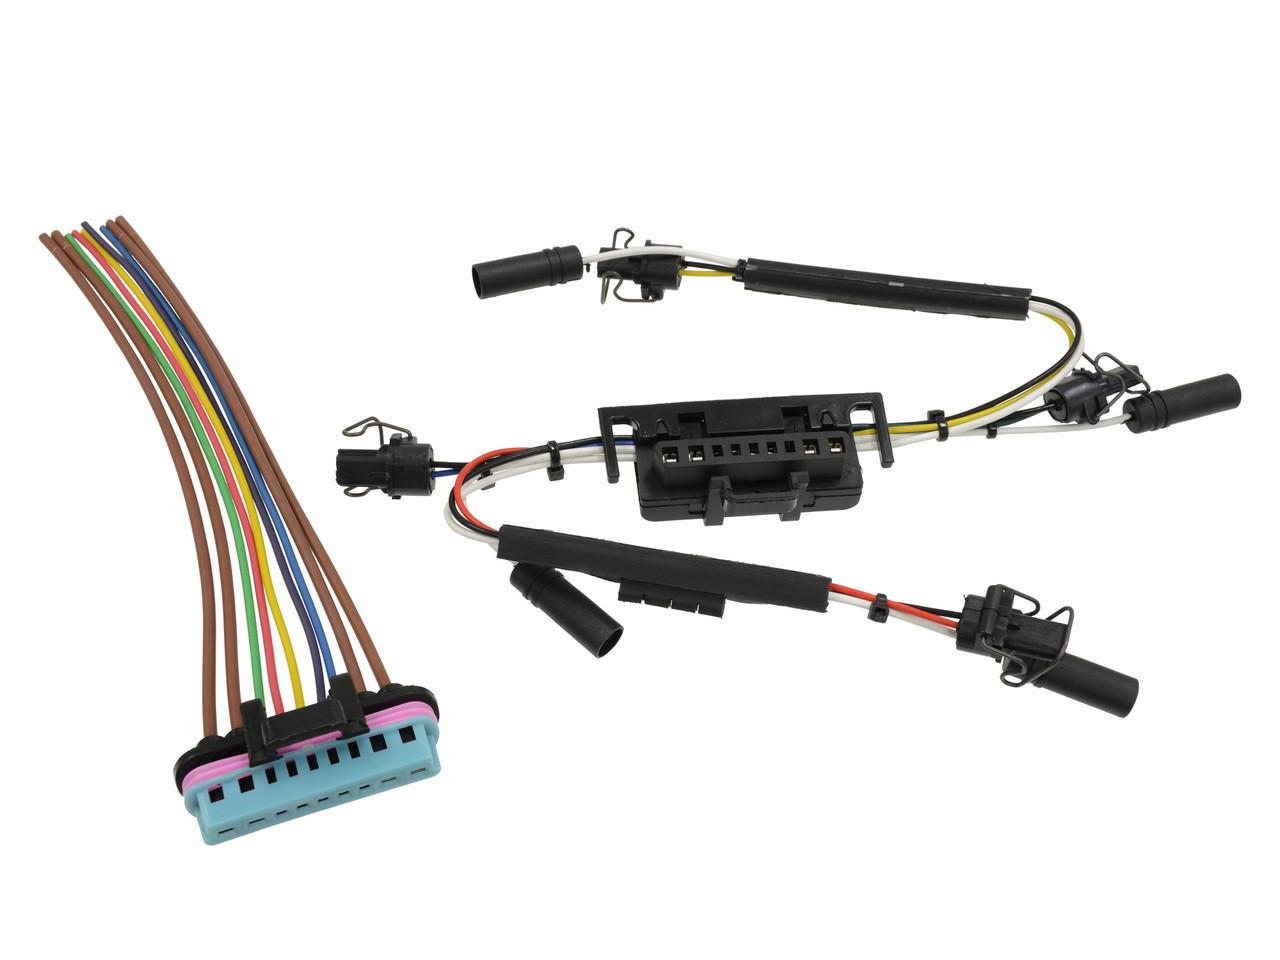 1997-2003 FORD 7.3L Powerstroke Diesel Glow Plug Injector harness pigtail